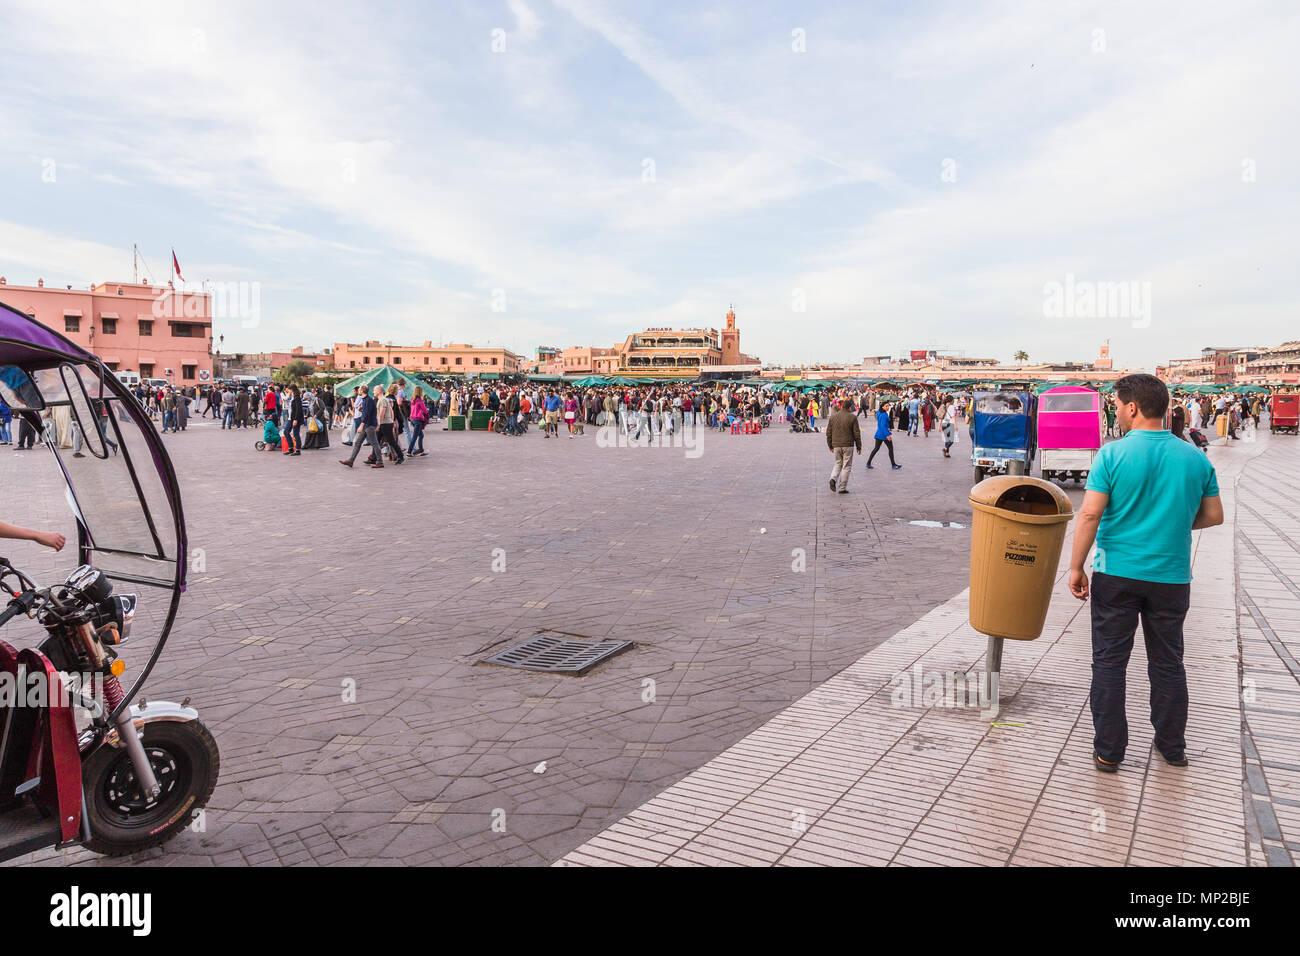 Jamaa el fna square, Marrakech, Morocco. Stock Photo